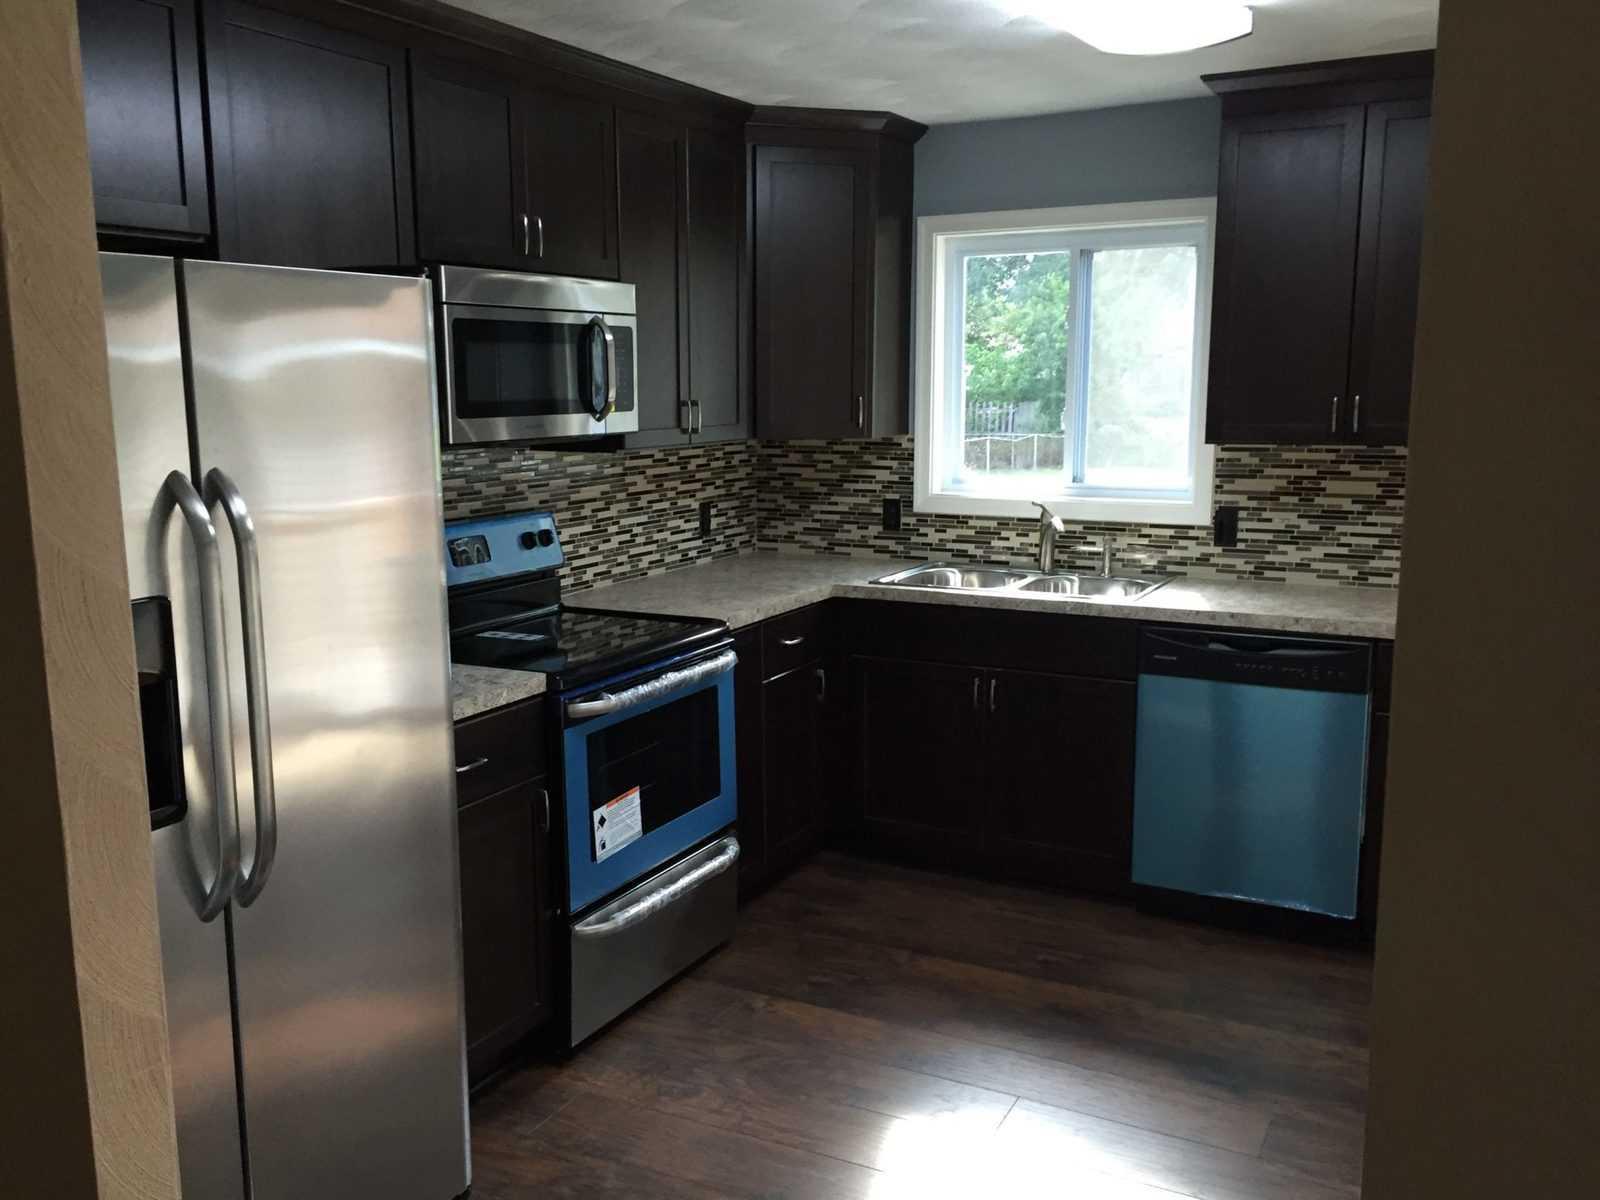 J Sadler Company Home Improvement Specialists